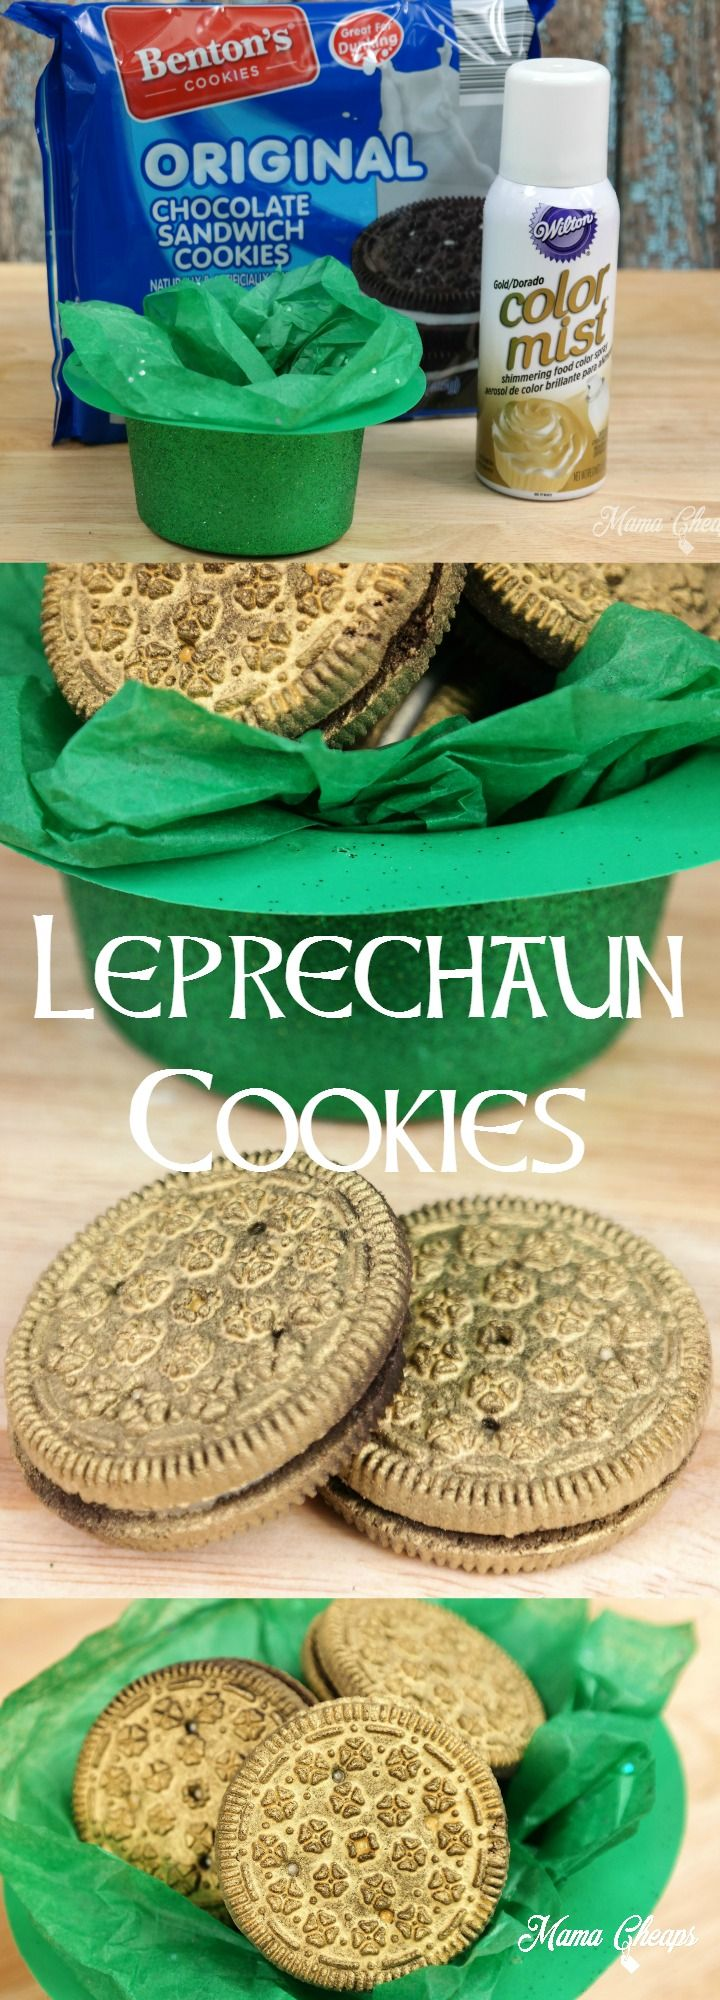 How to Make Leprechaun Cookies | St. Patrick's Day Leprechaun Trick